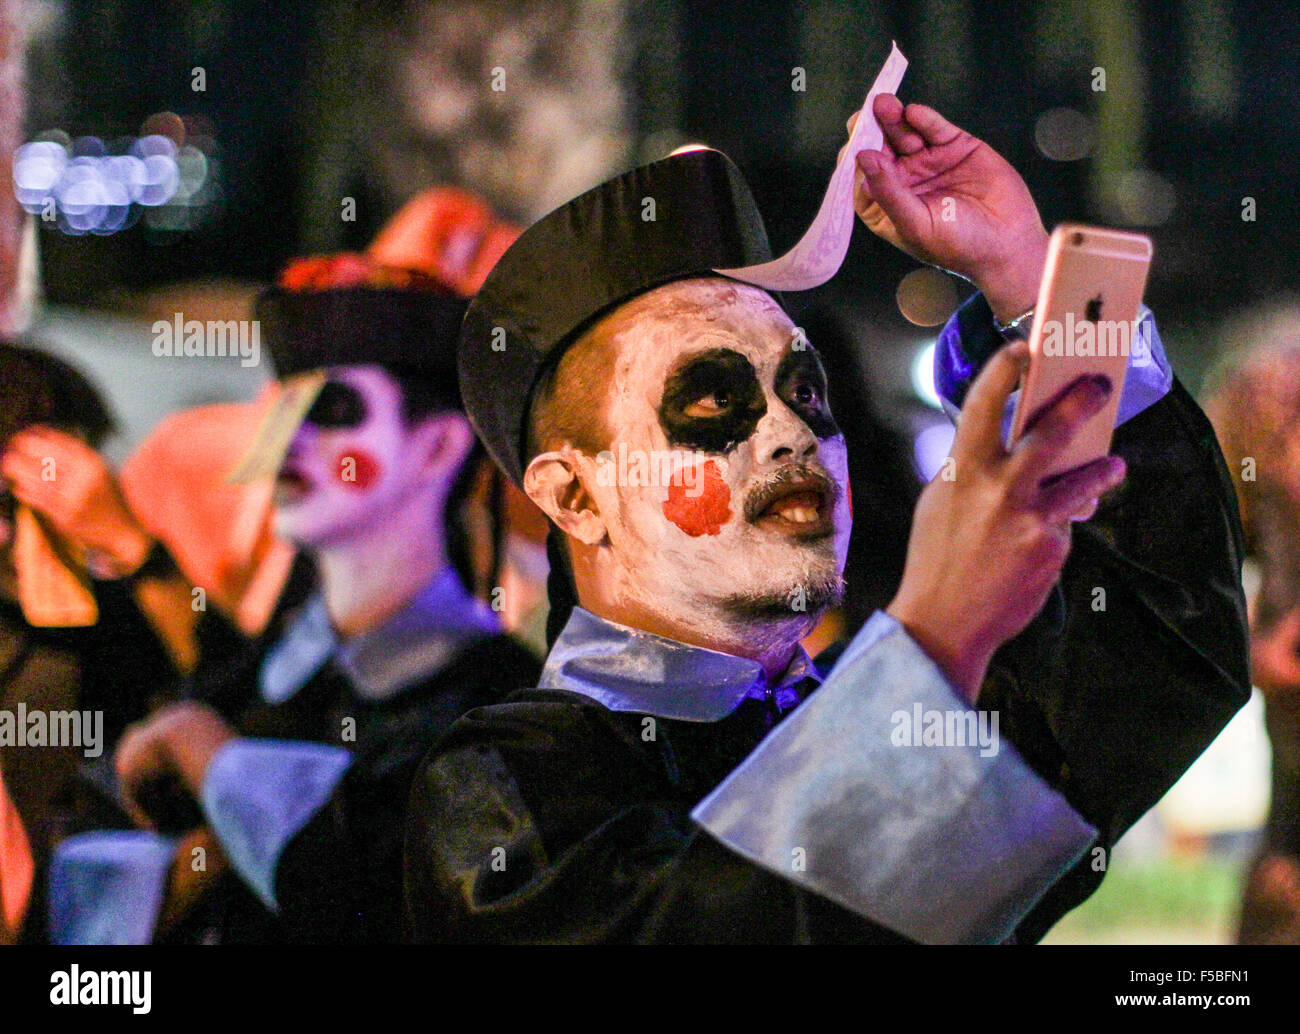 Halloween Usa Costume Hollywood Stock Photos & Halloween Usa ...